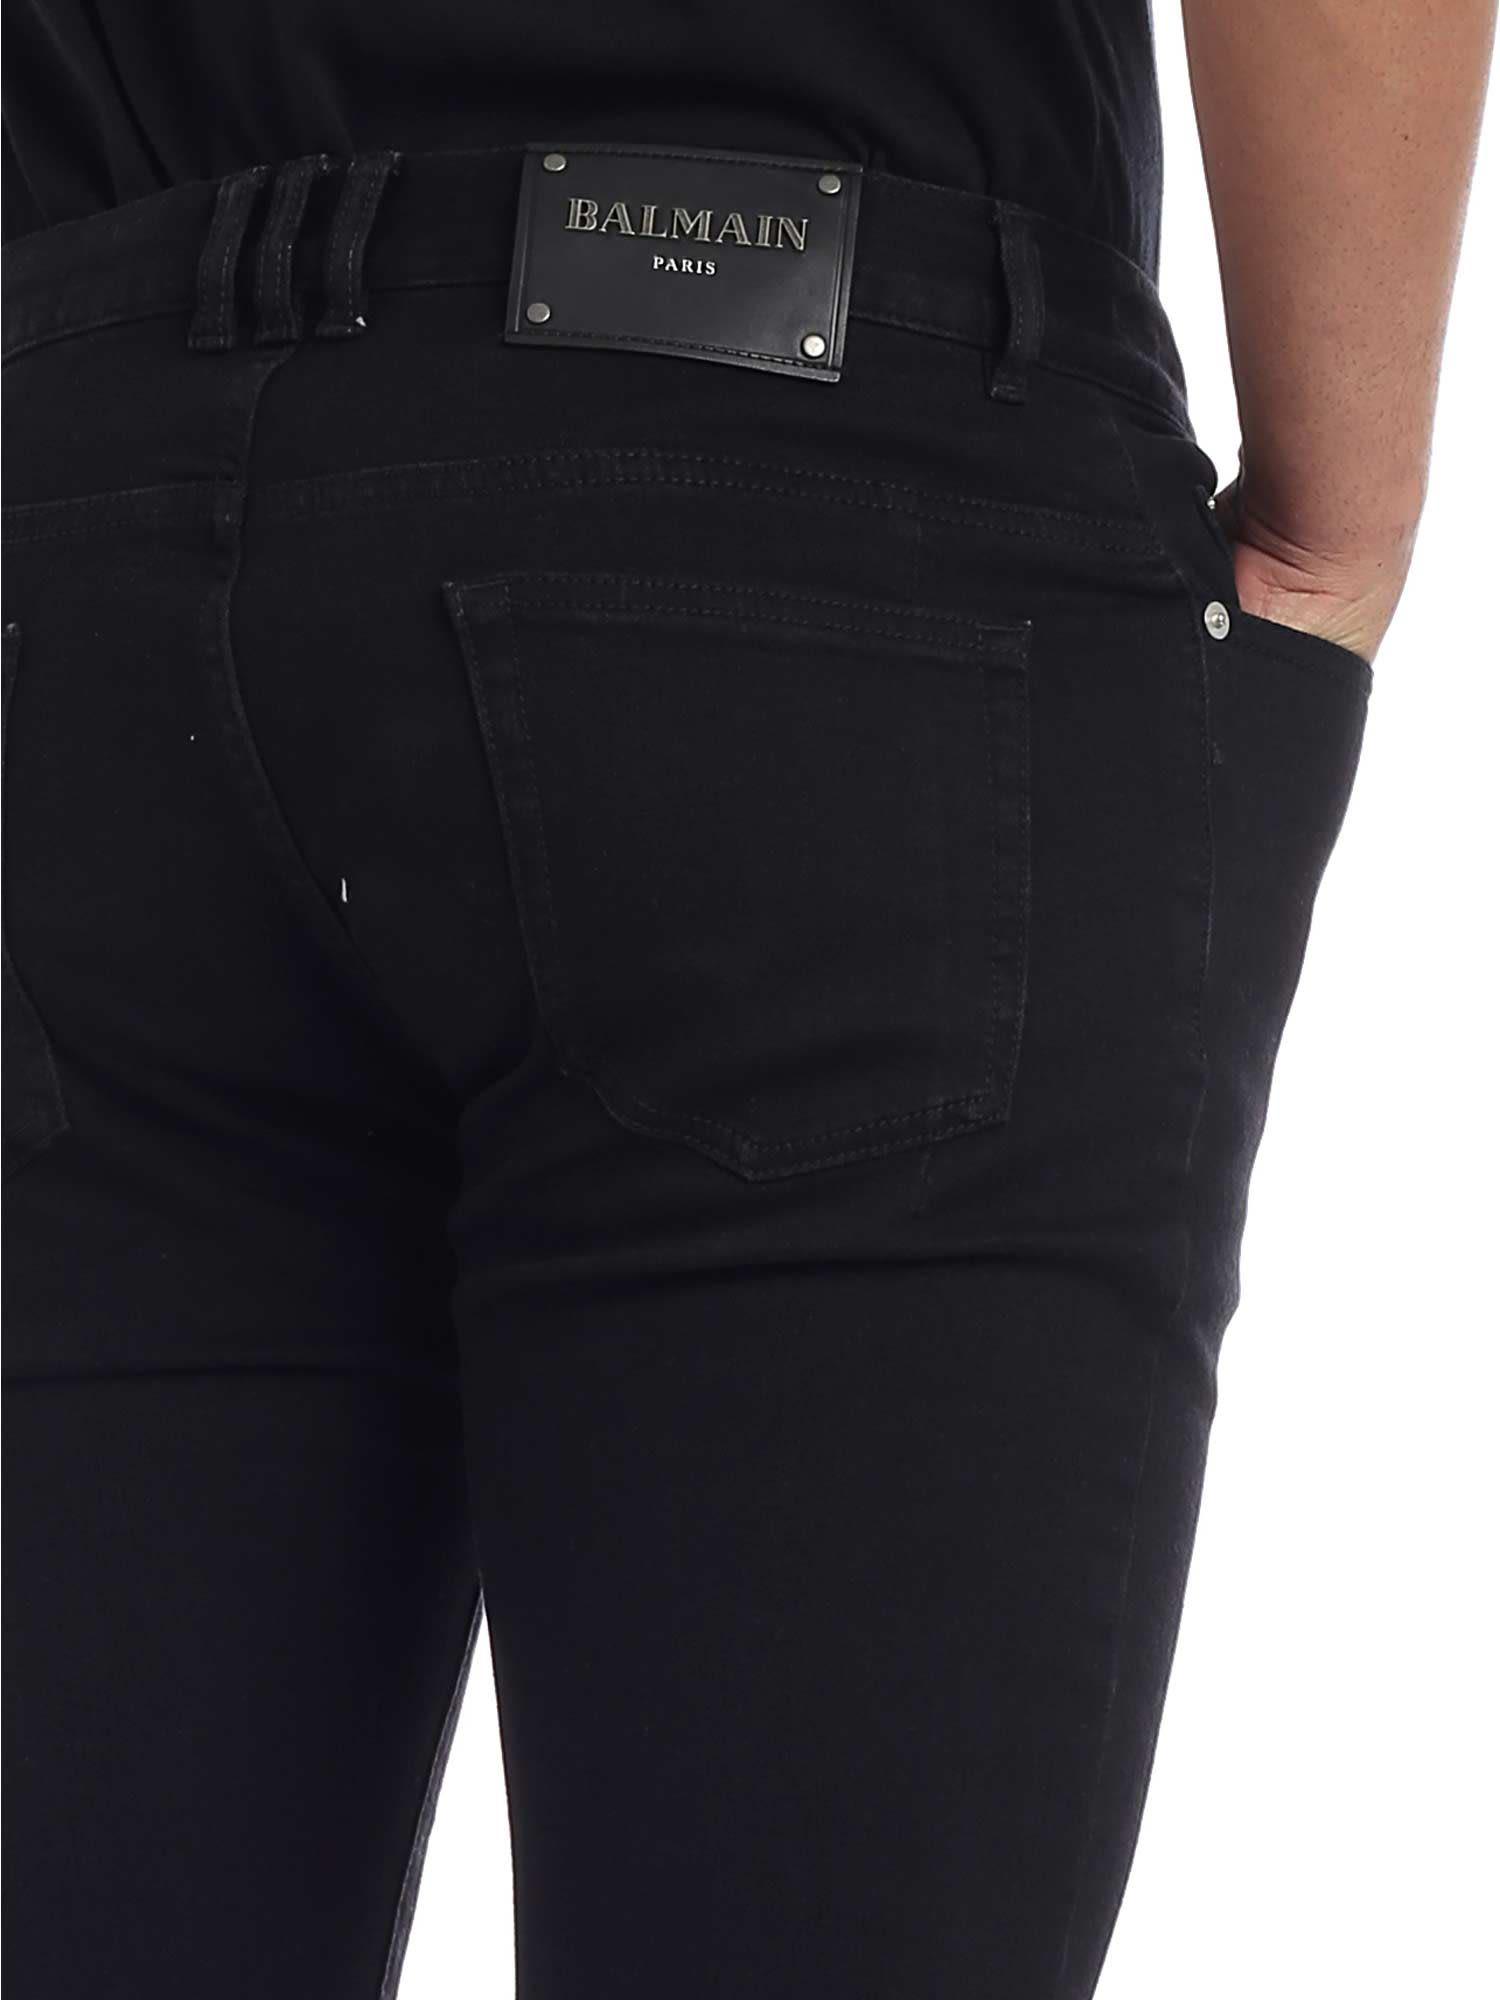 Italist Best Price In The Market For Balmain Knee Ripped Jeans Biker Black Faded Nero